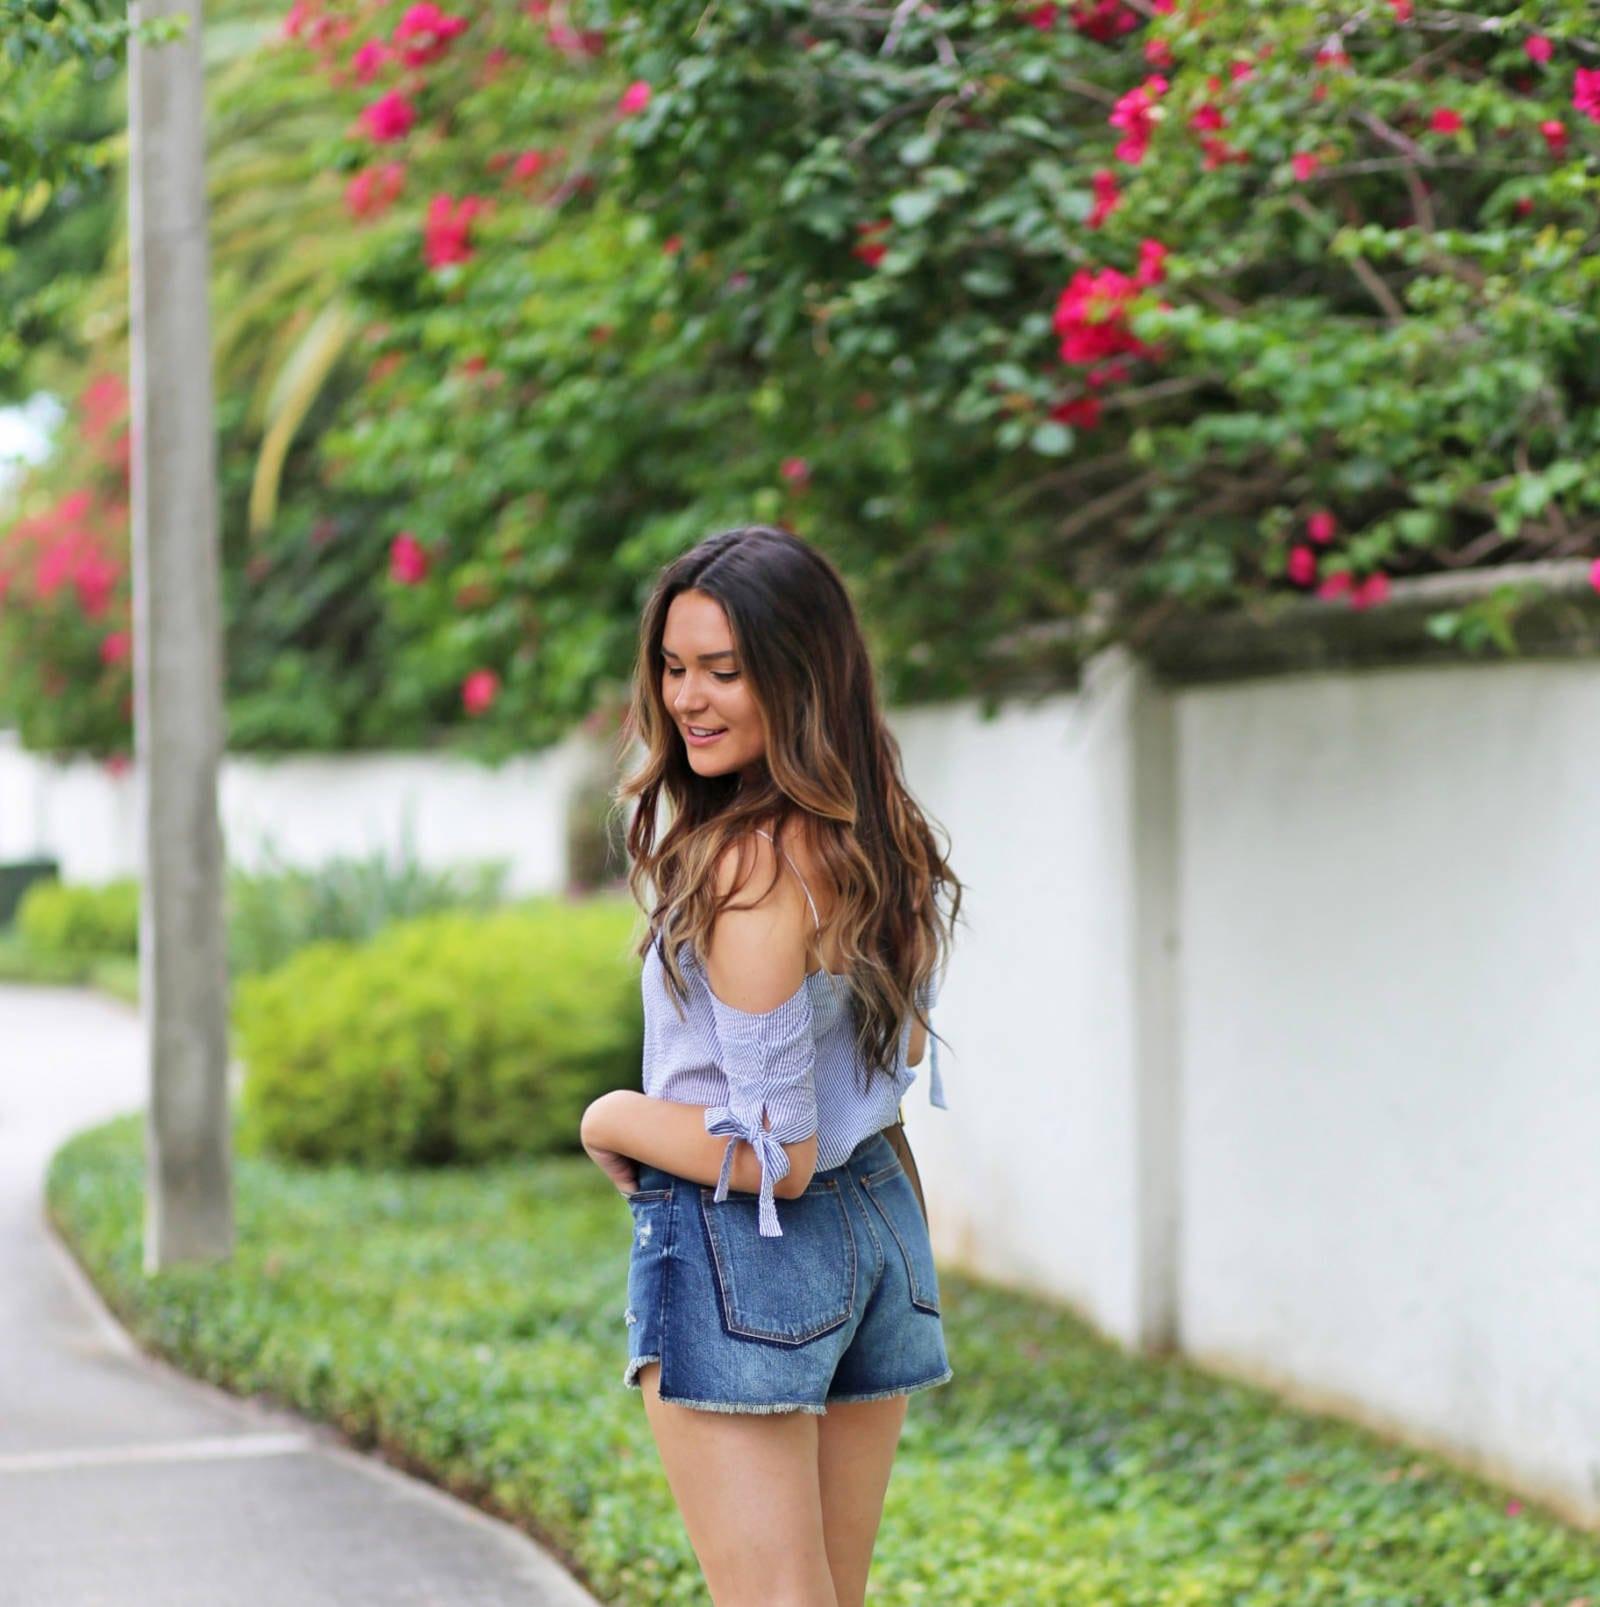 Mash Elle beauty blogger |  off the shoulder top | striped shirt | blush purse |  jean shorts | white mule sandals